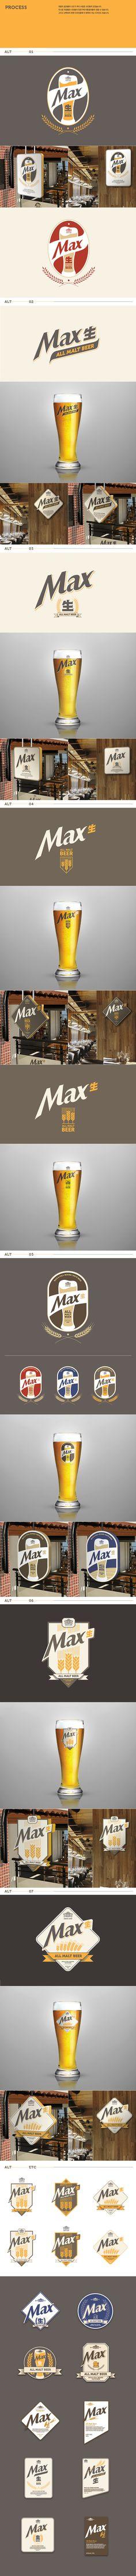 HITE MAX生 Brand Experience Design